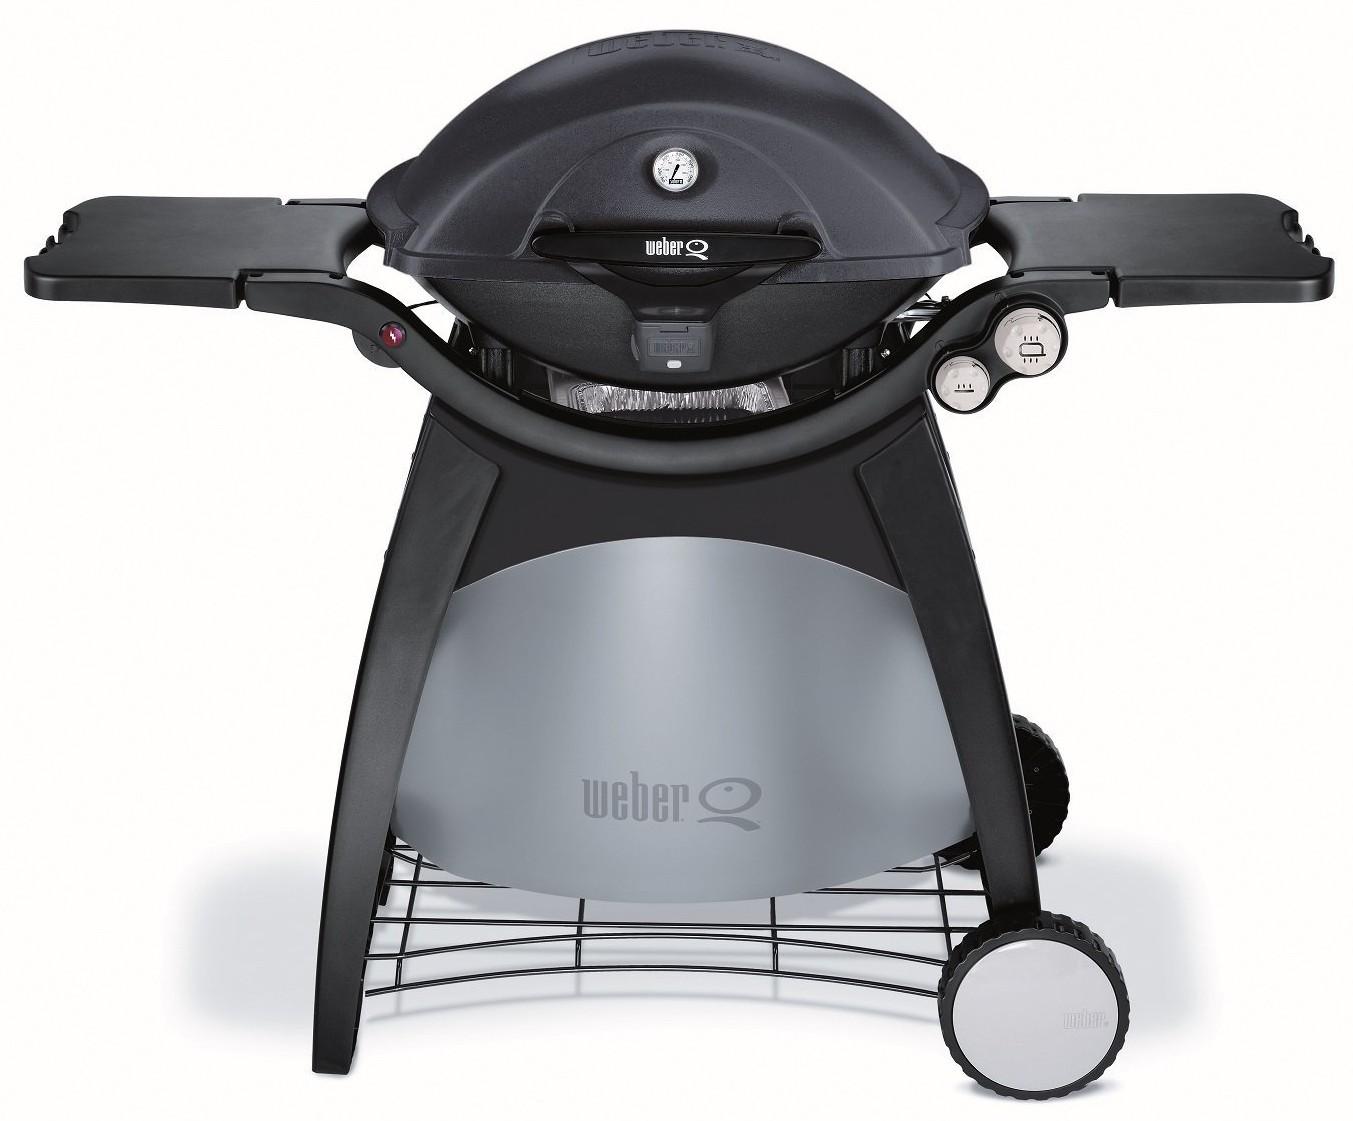 Bester Holzkohlegrill Gebraucht : Weber q320 details fazit wissenswertes weber grill